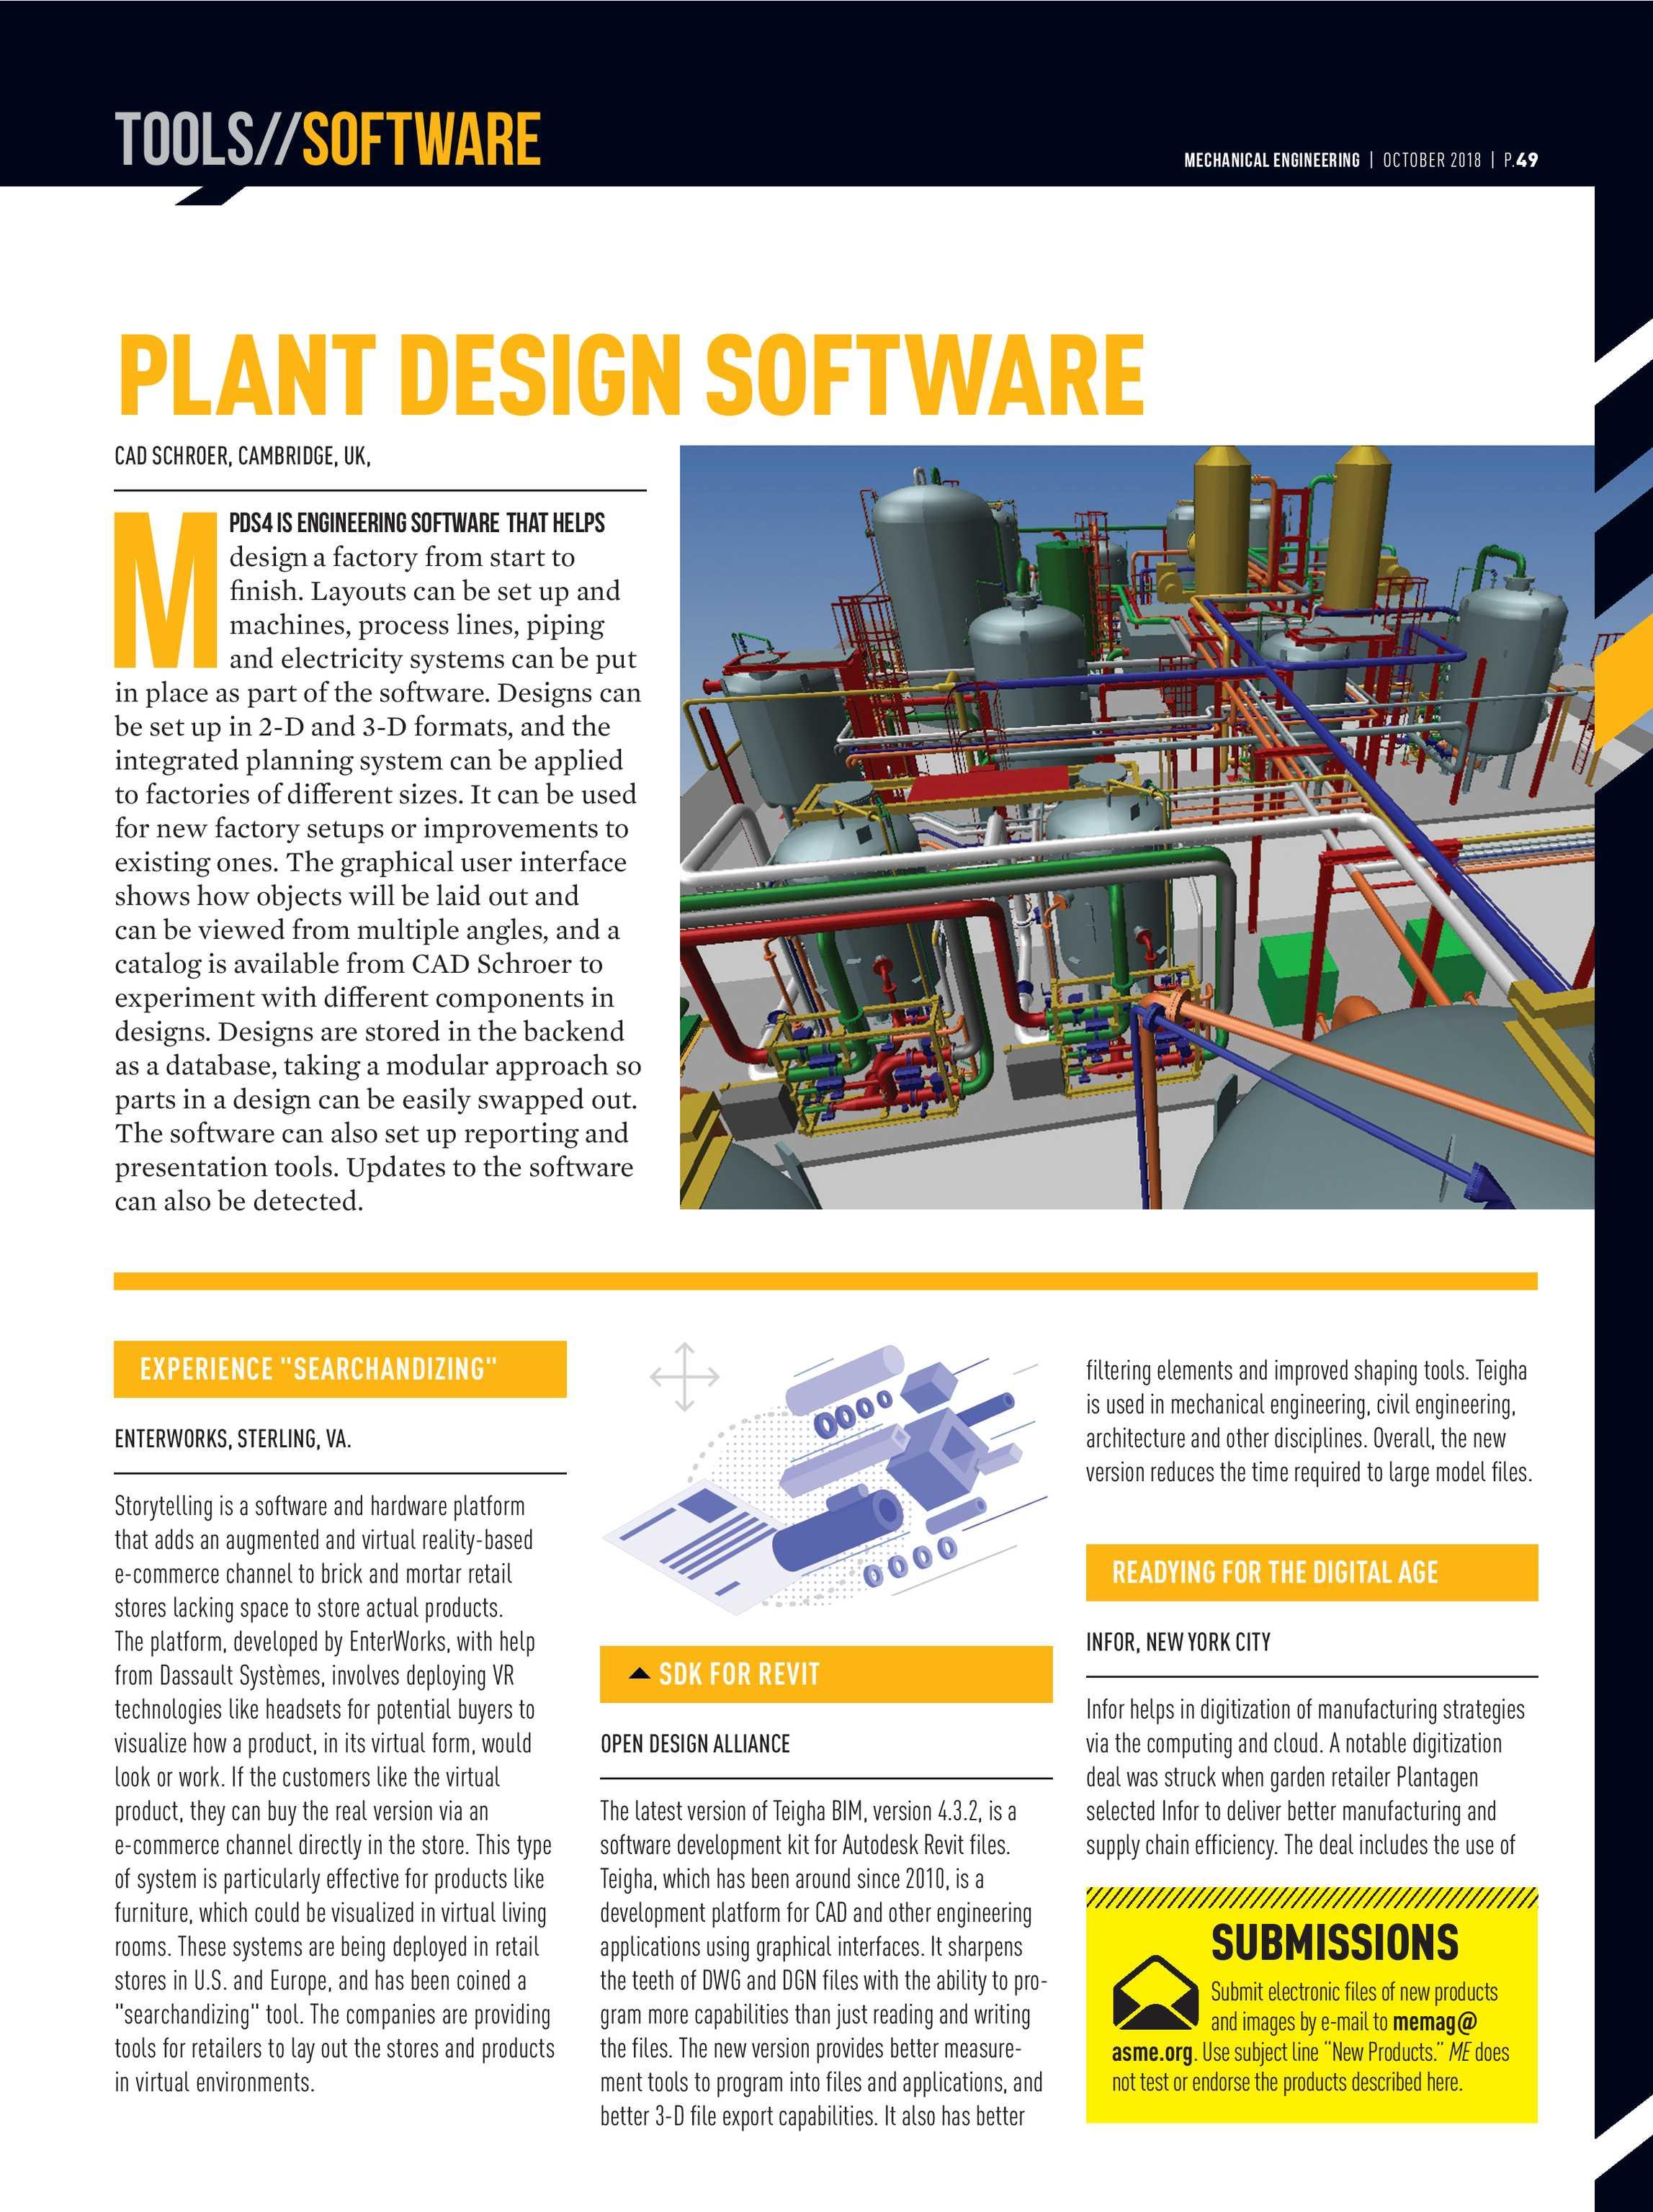 Mechanical Engineering Magazine - October 2018 - page 49